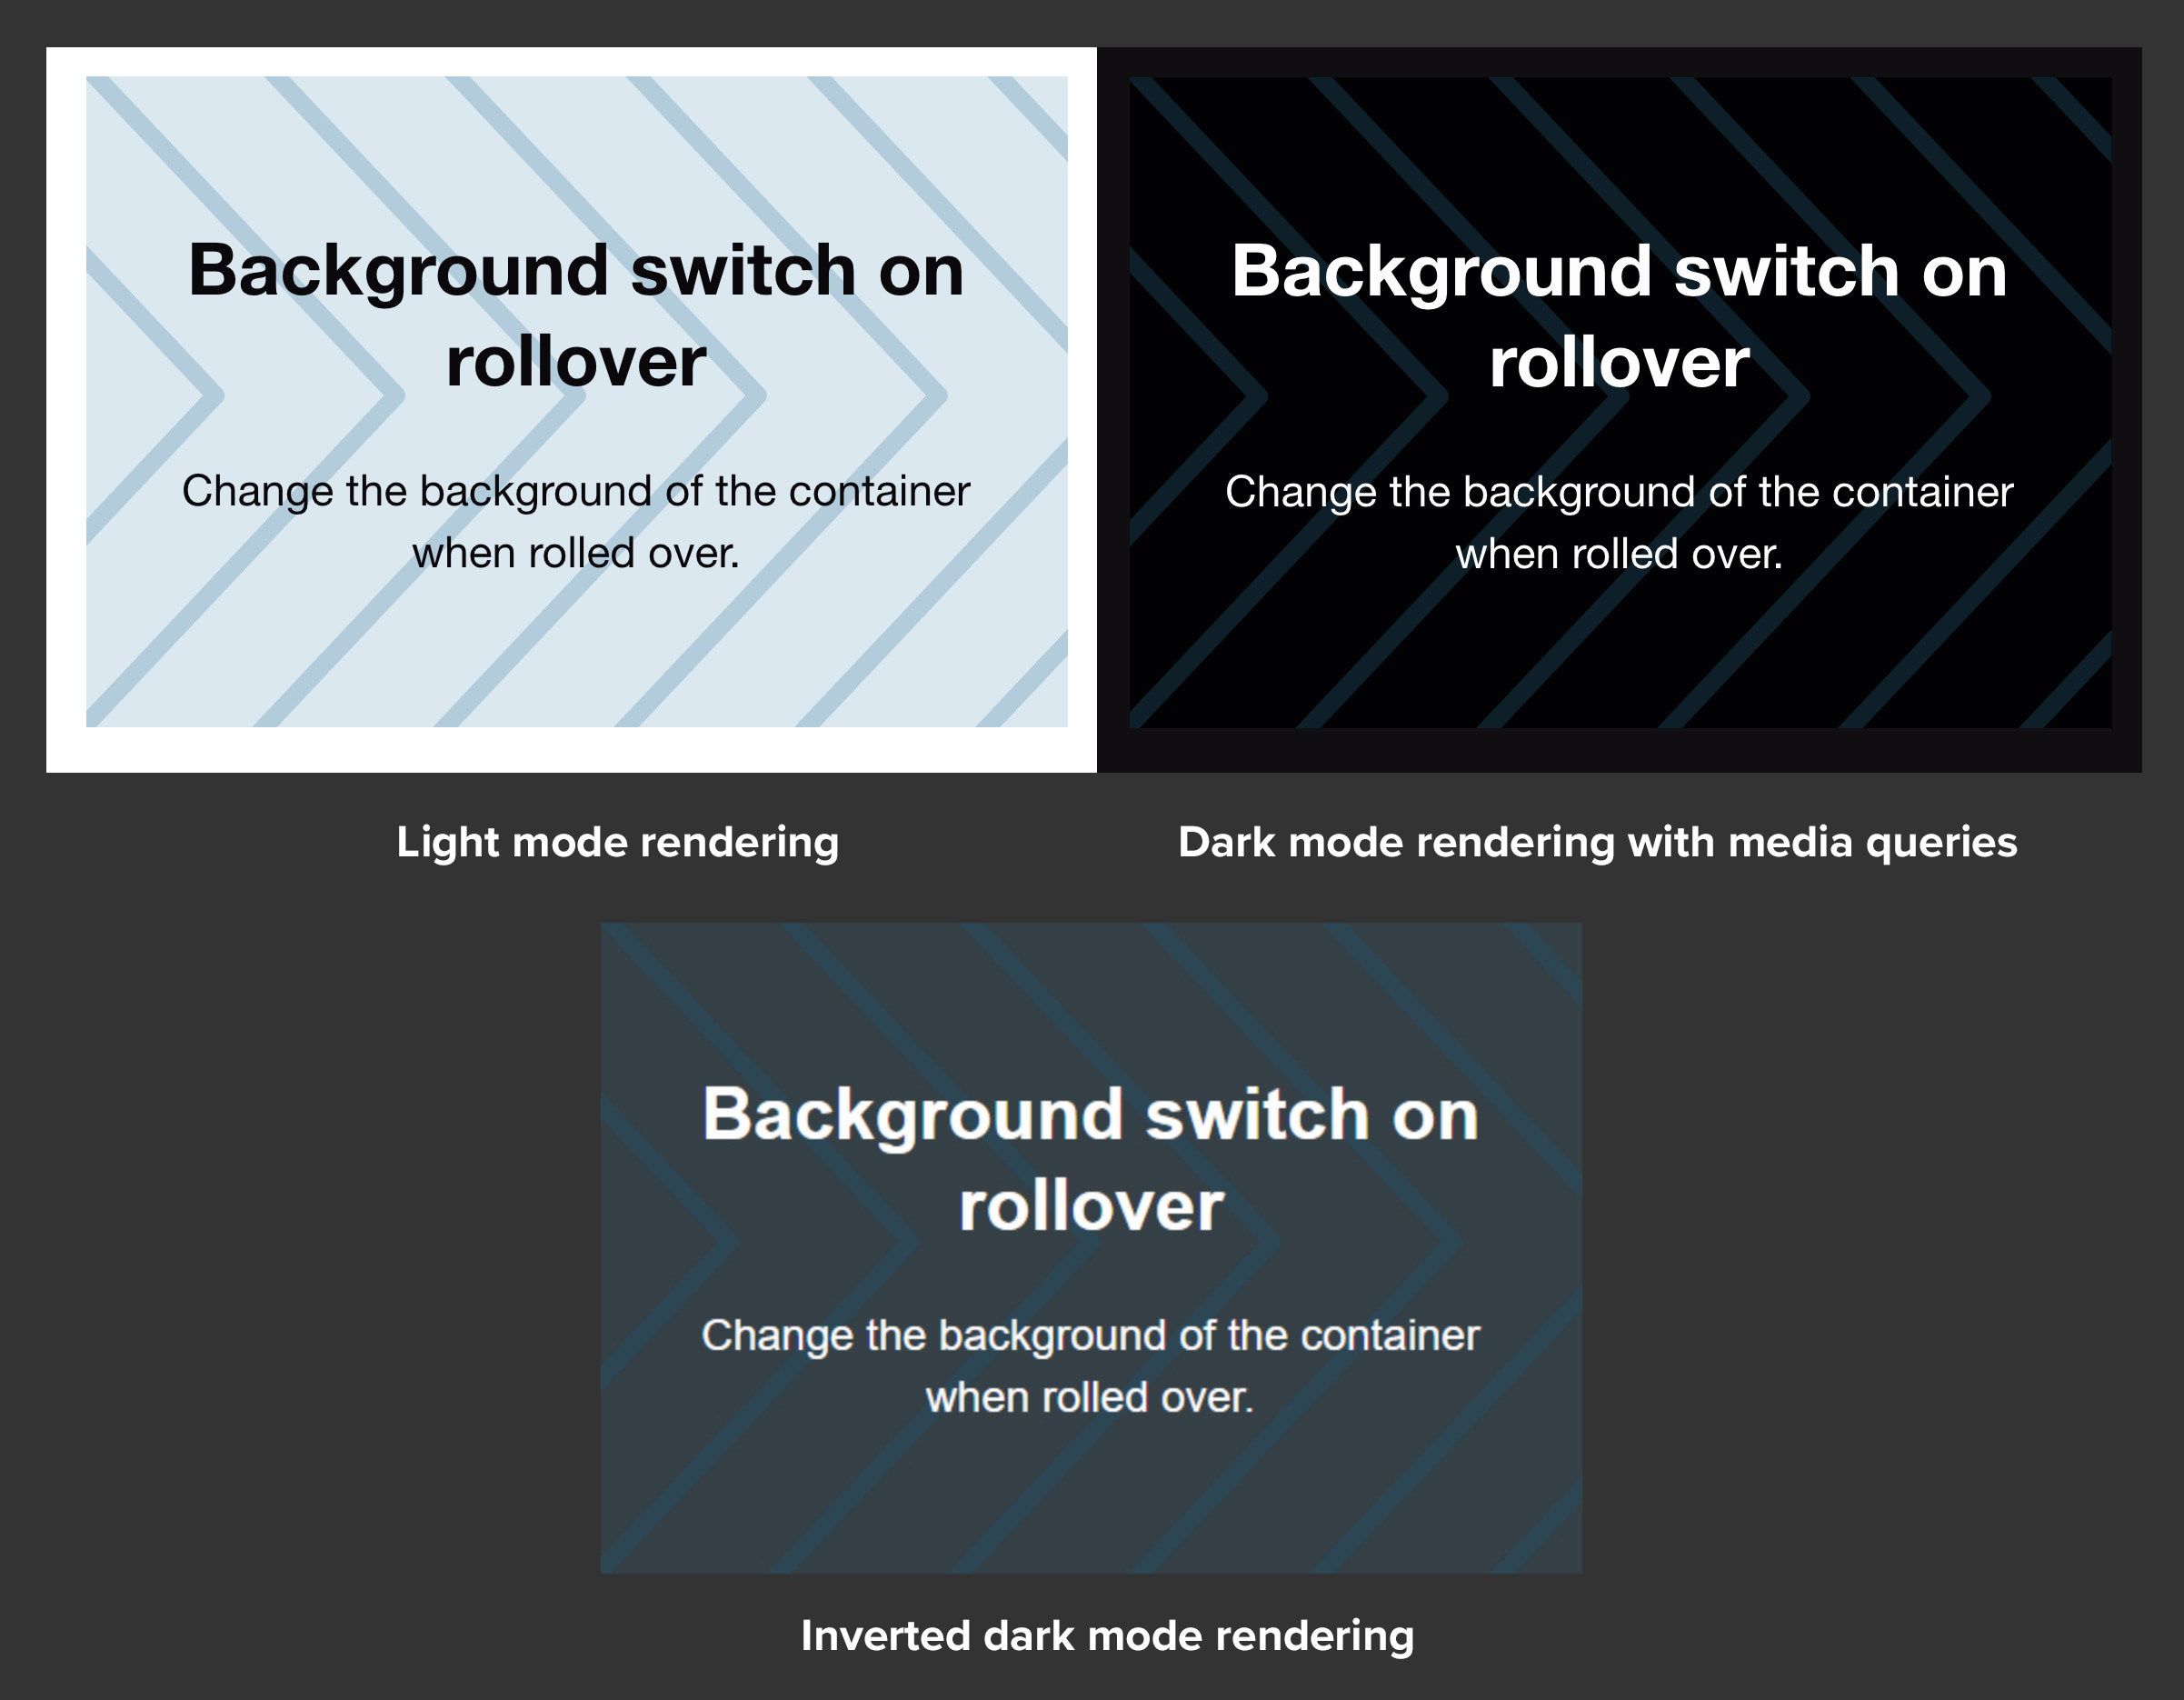 email background image in different Dark Mode scenarios